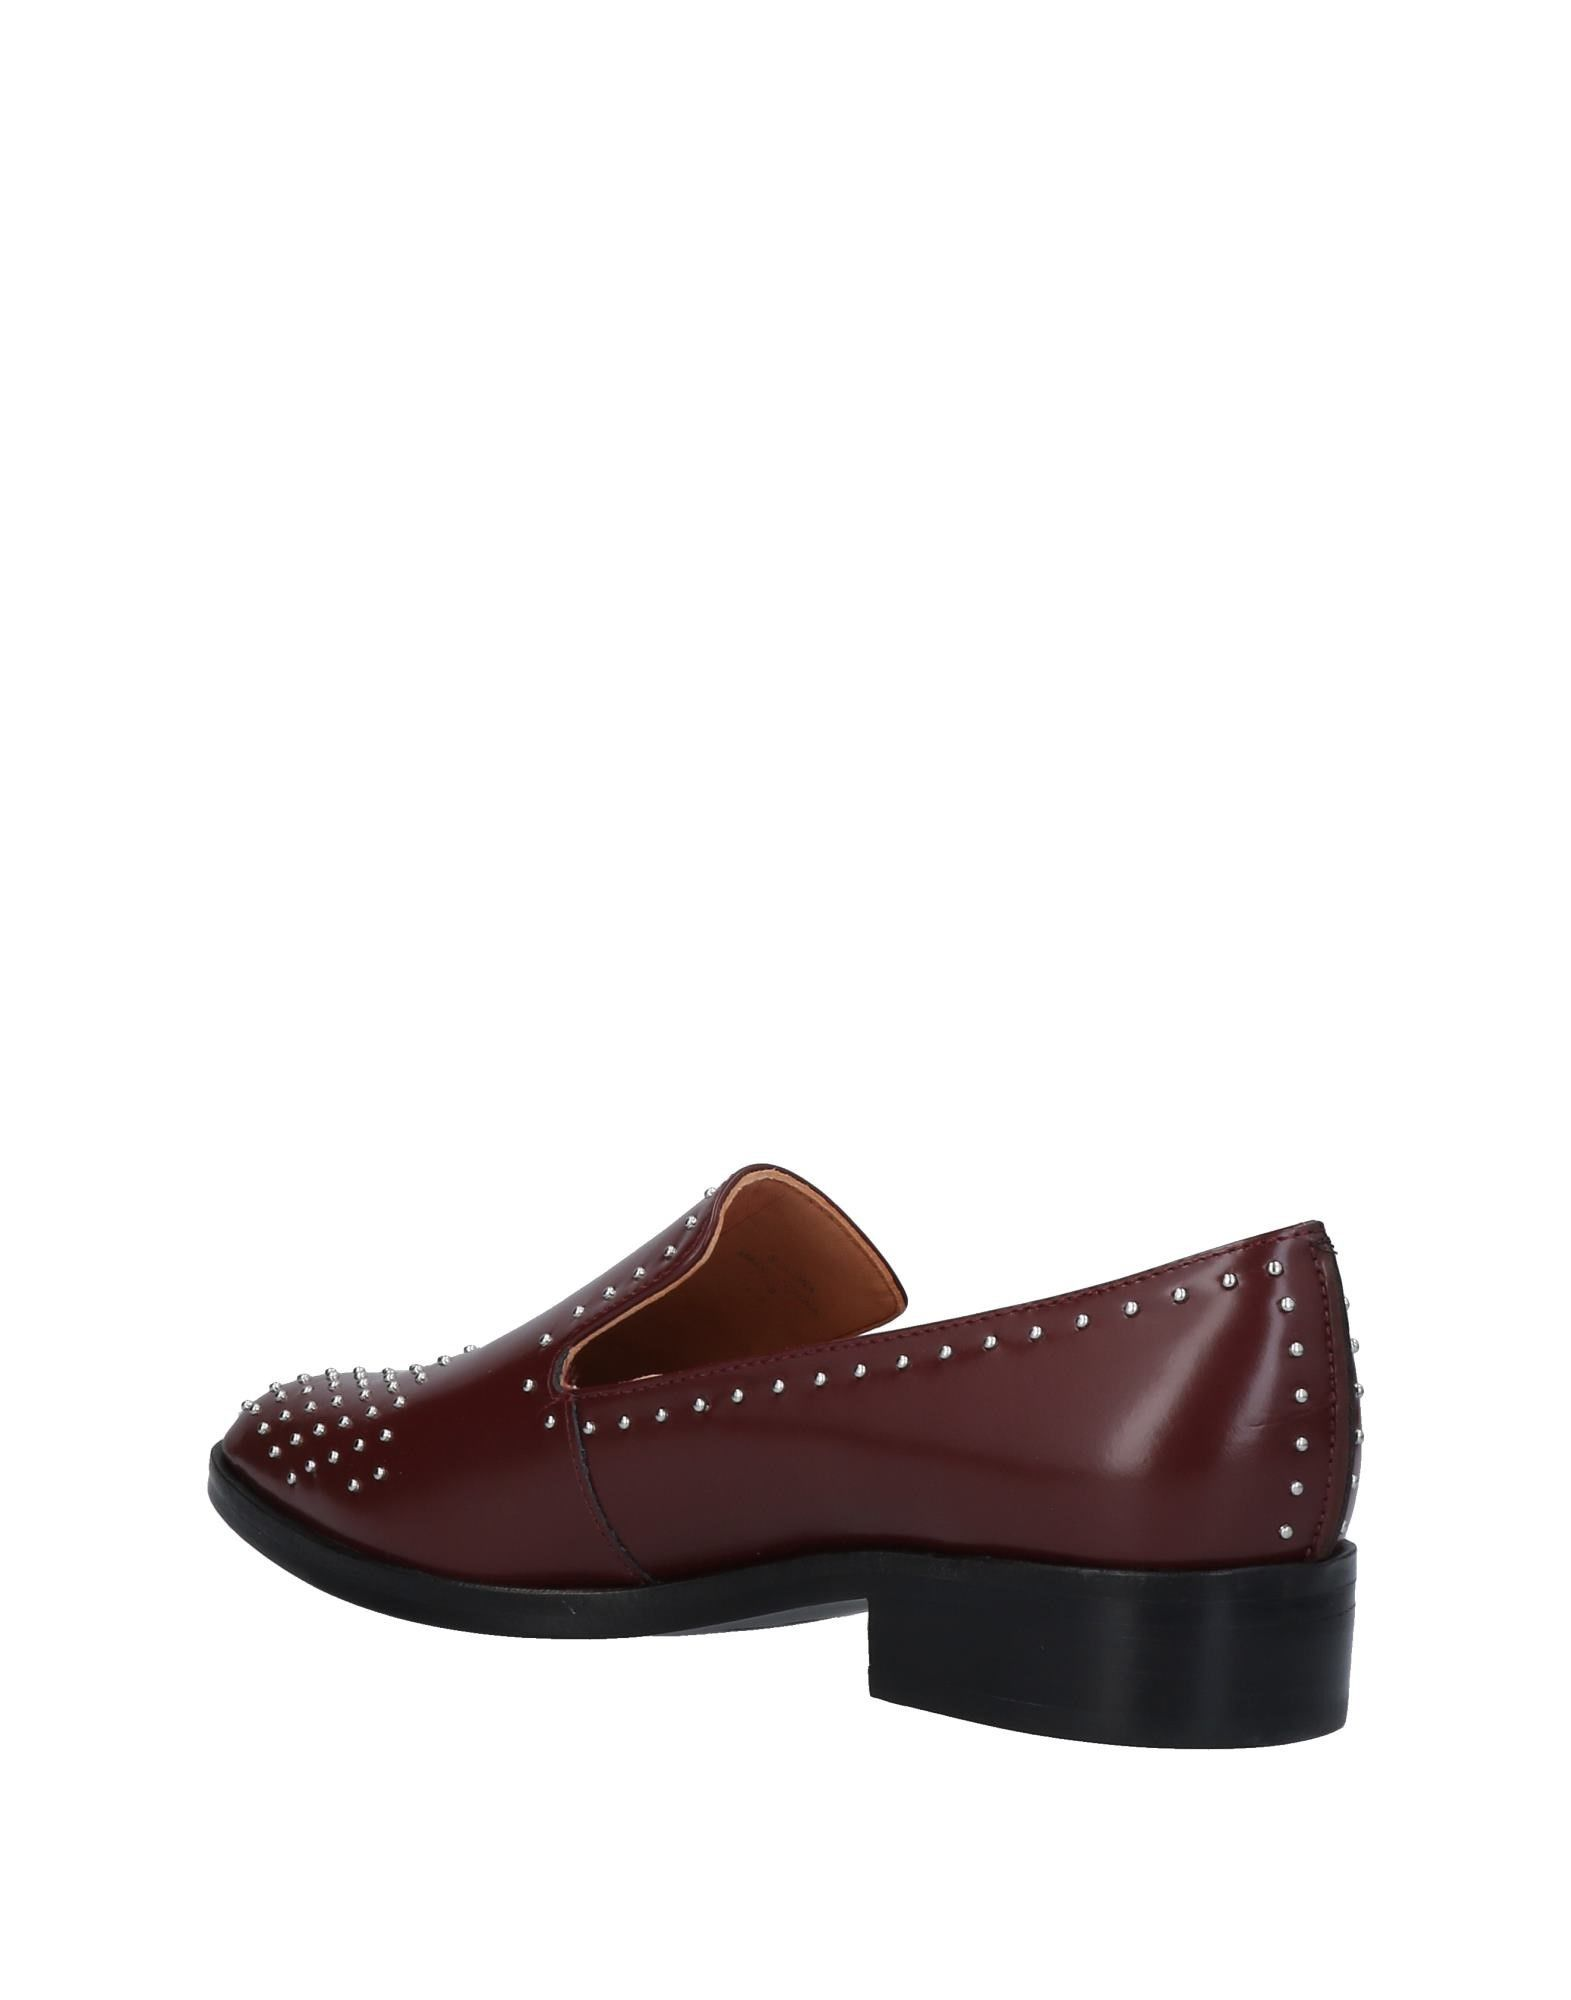 Stilvolle billige Schuhe Sigerson 11452717KL Morrison Mokassins Damen  11452717KL Sigerson 69c30c